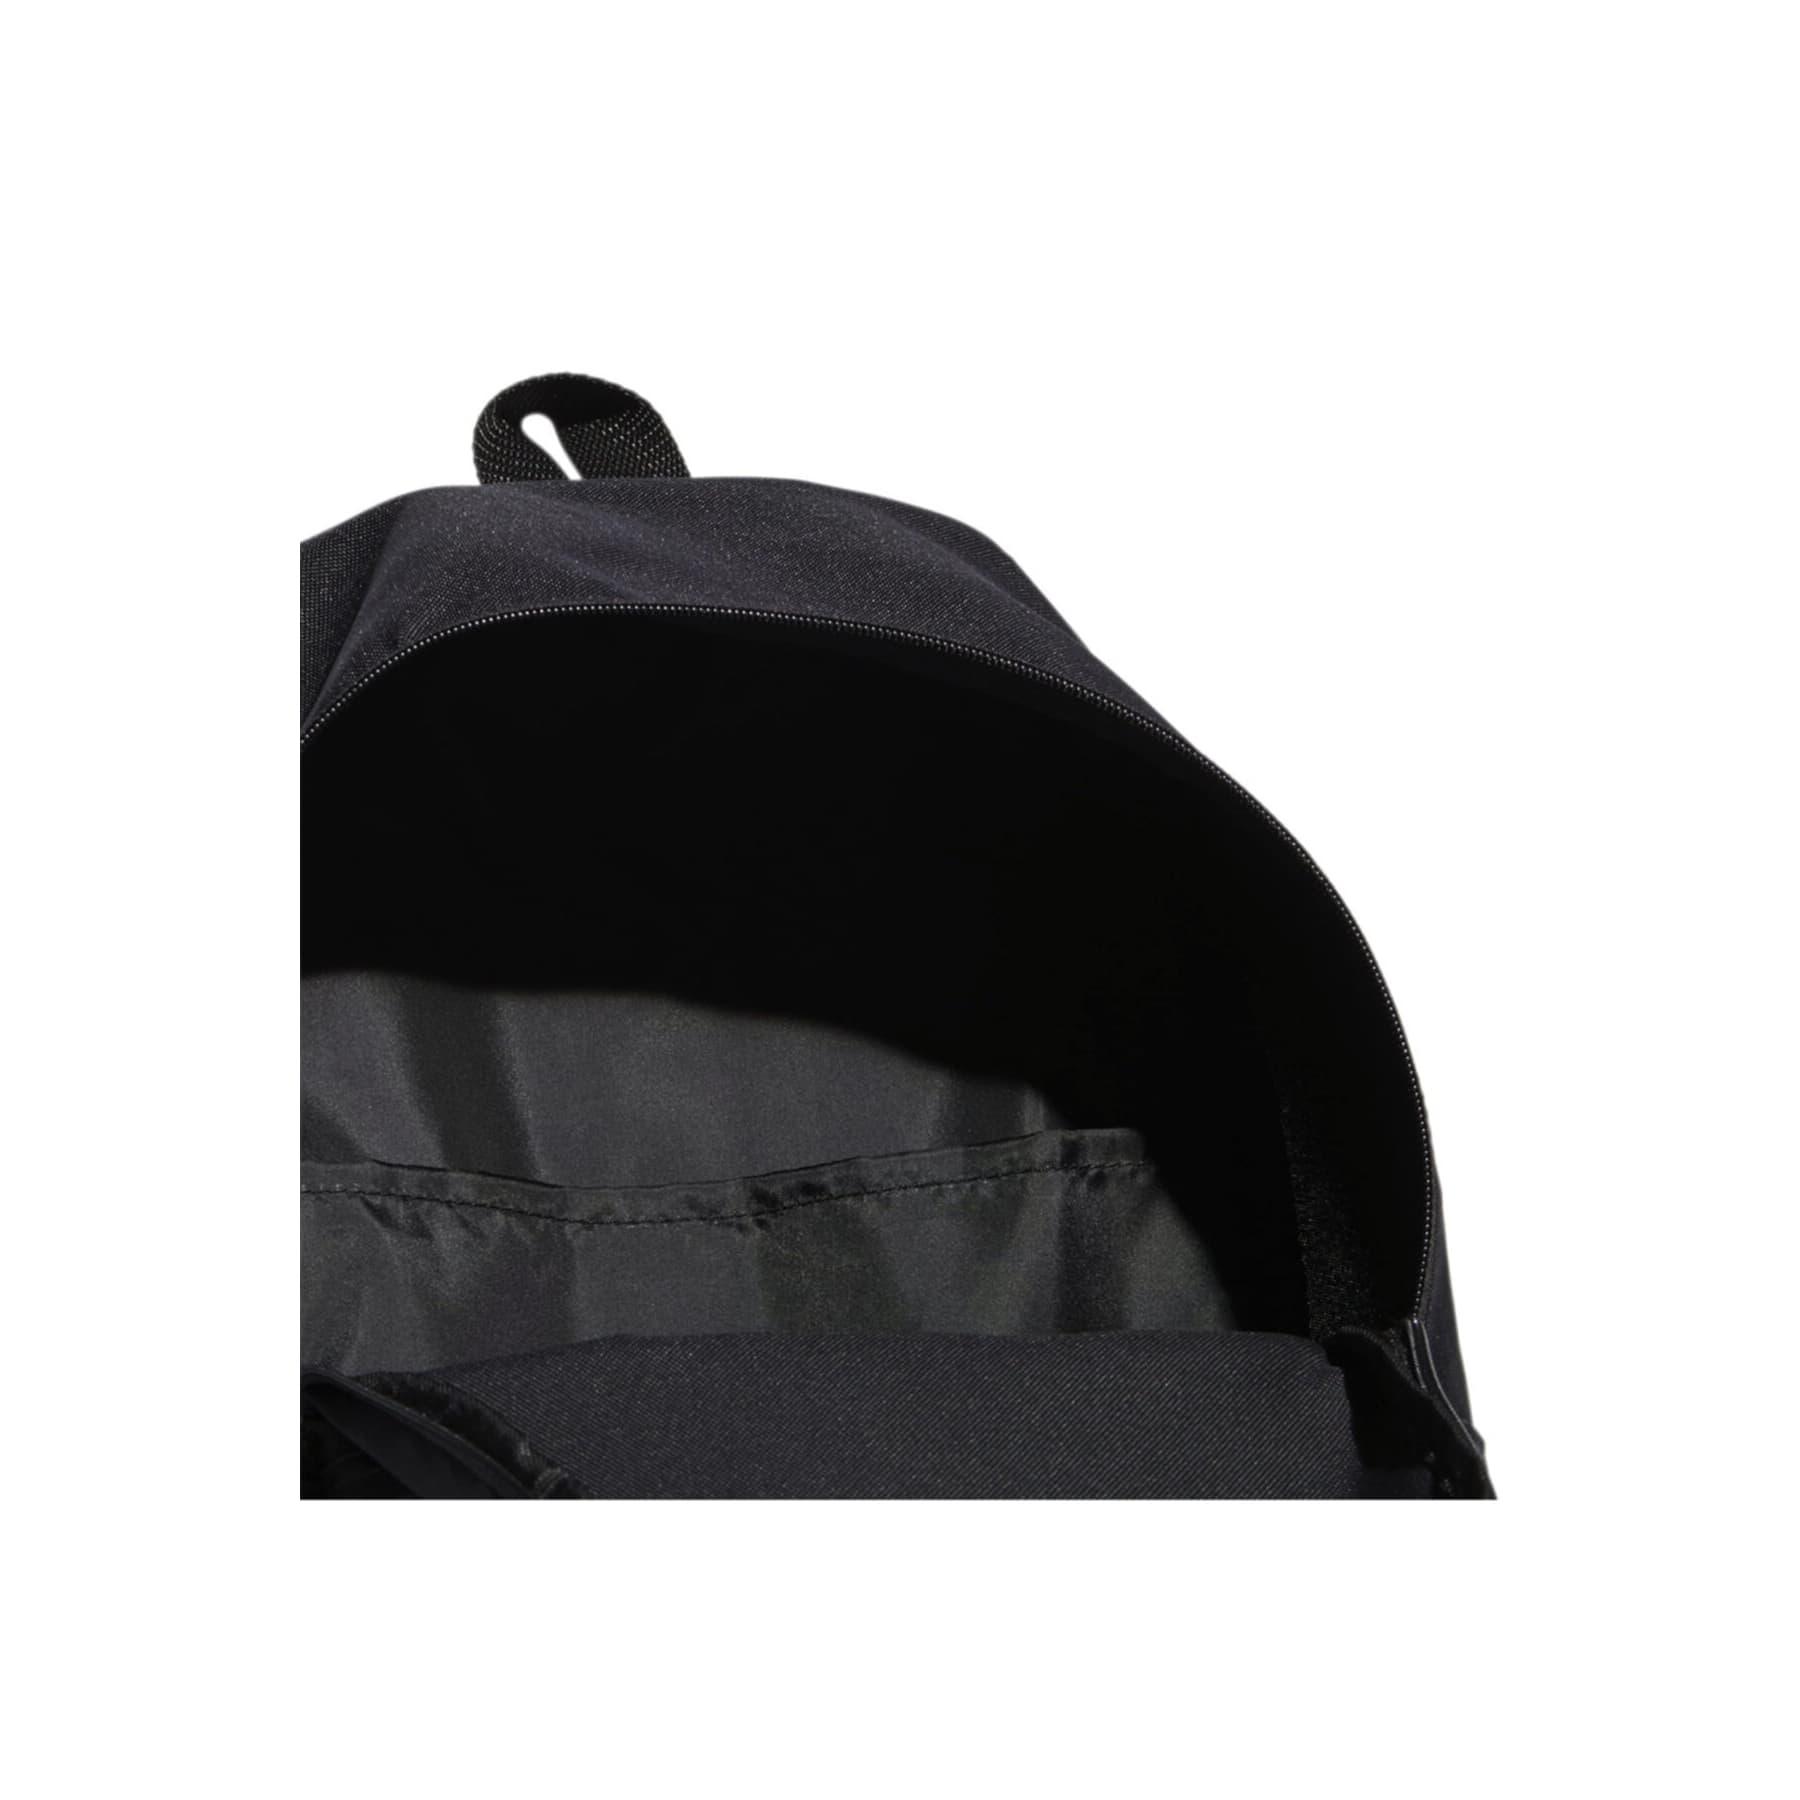 Linear Classic Daily Siyah Sırt Çantası (GE5566)